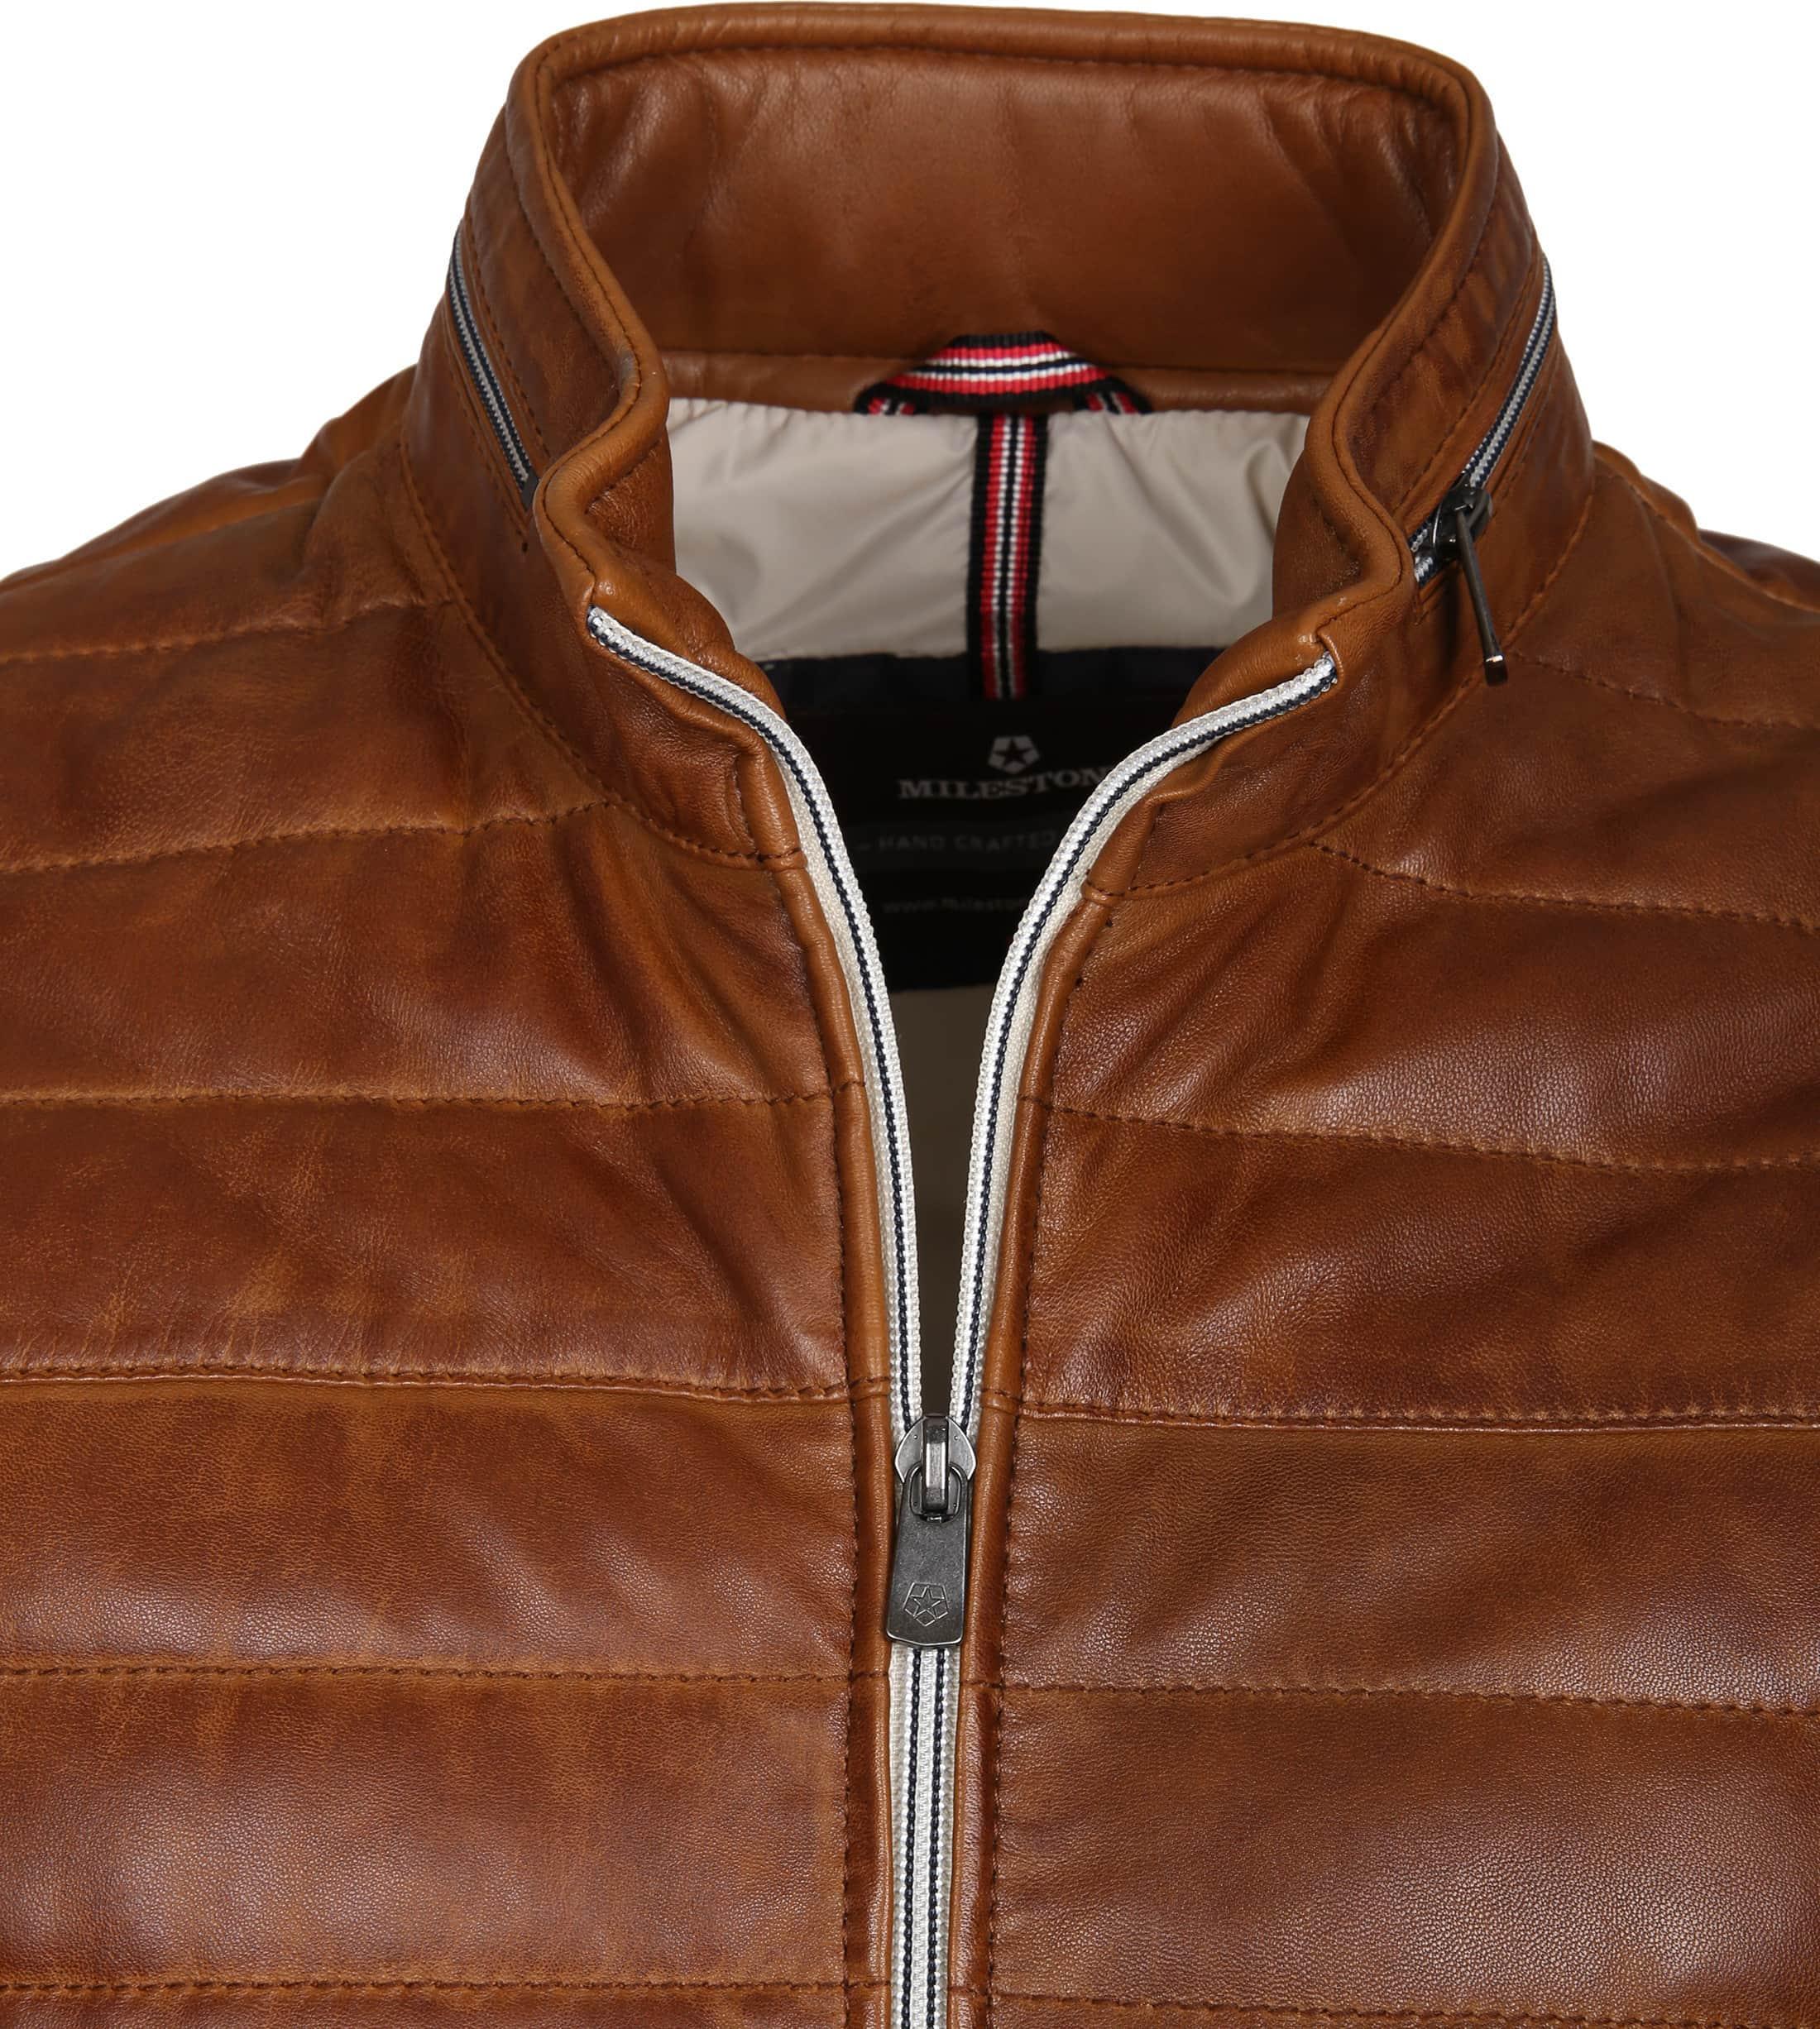 Milestone Tereno Leather Jacke Cognac Foto 1